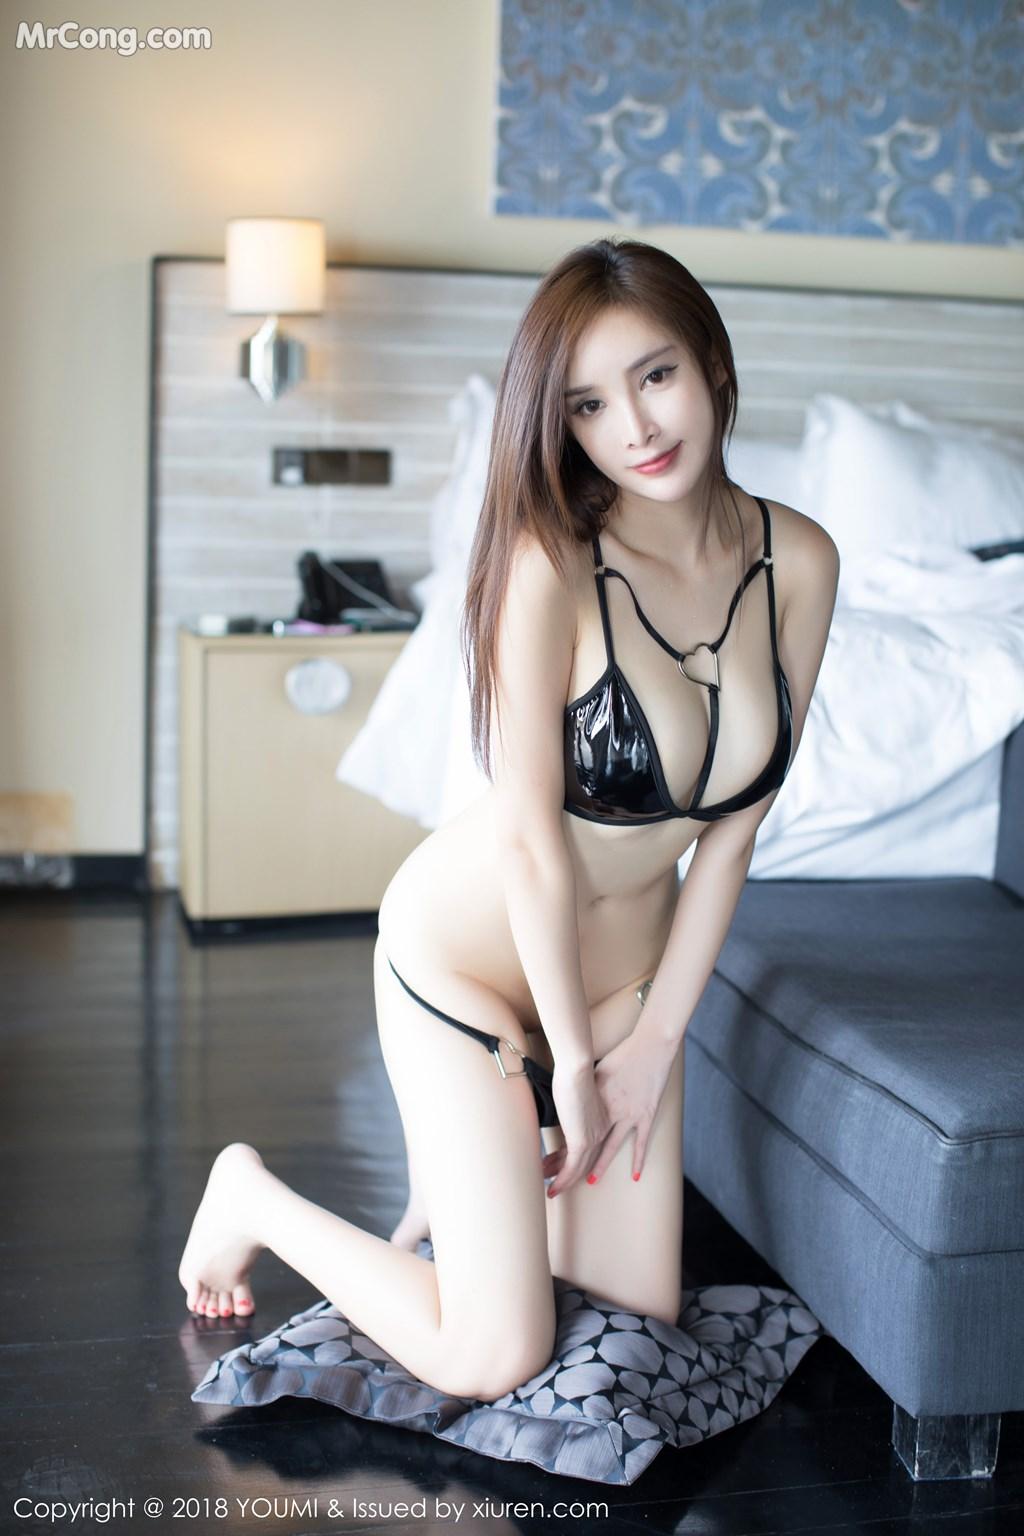 Image YouMi-Vol.237-Tu-Fei-Yuan-Ai-Cuo-Qiong-MrCong.com-007 in post YouMi Vol.237: Người mẫu 奶瓶土肥圆 (46 ảnh)